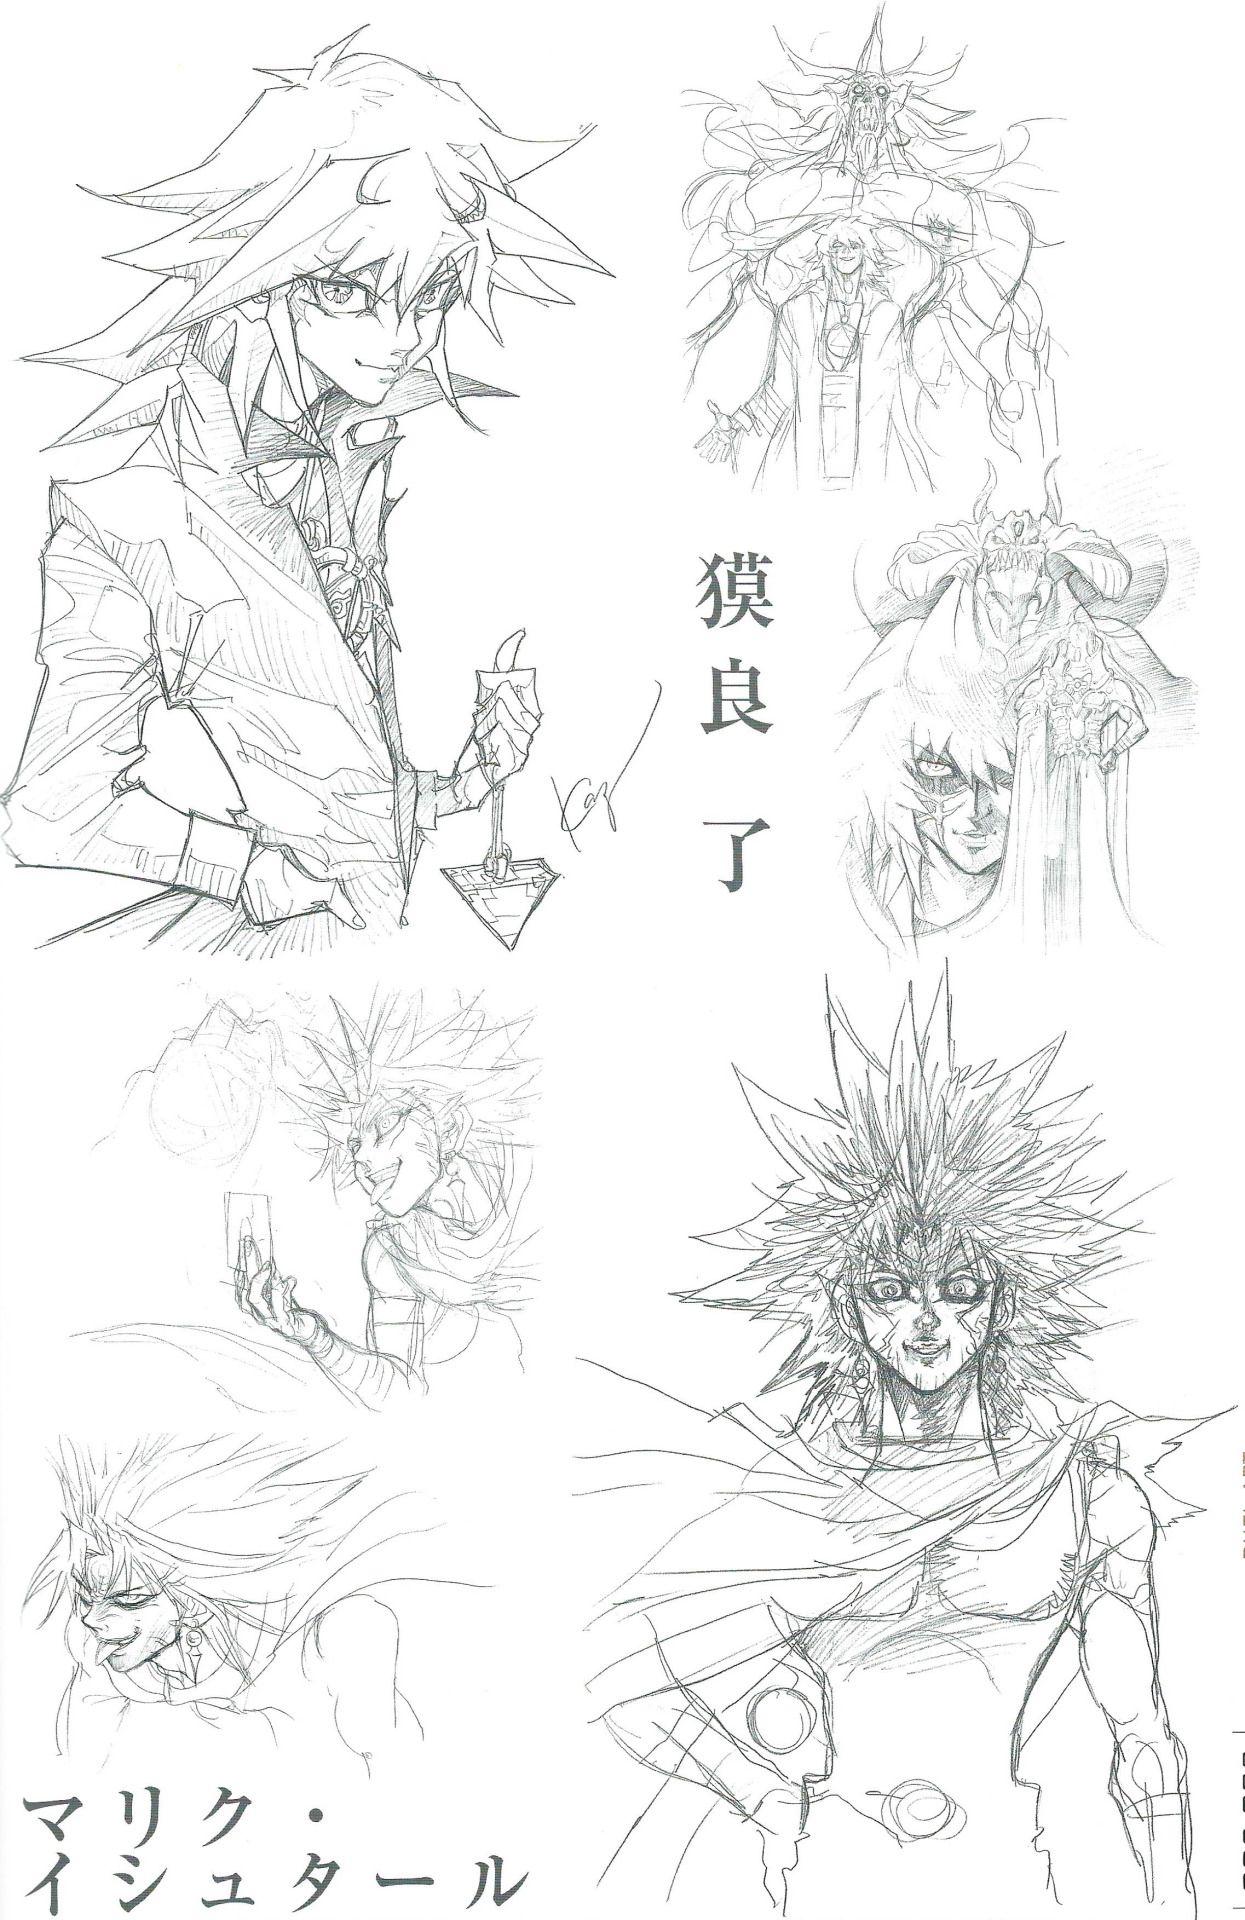 Tumblrnjcmhrqorlogog duel monsters